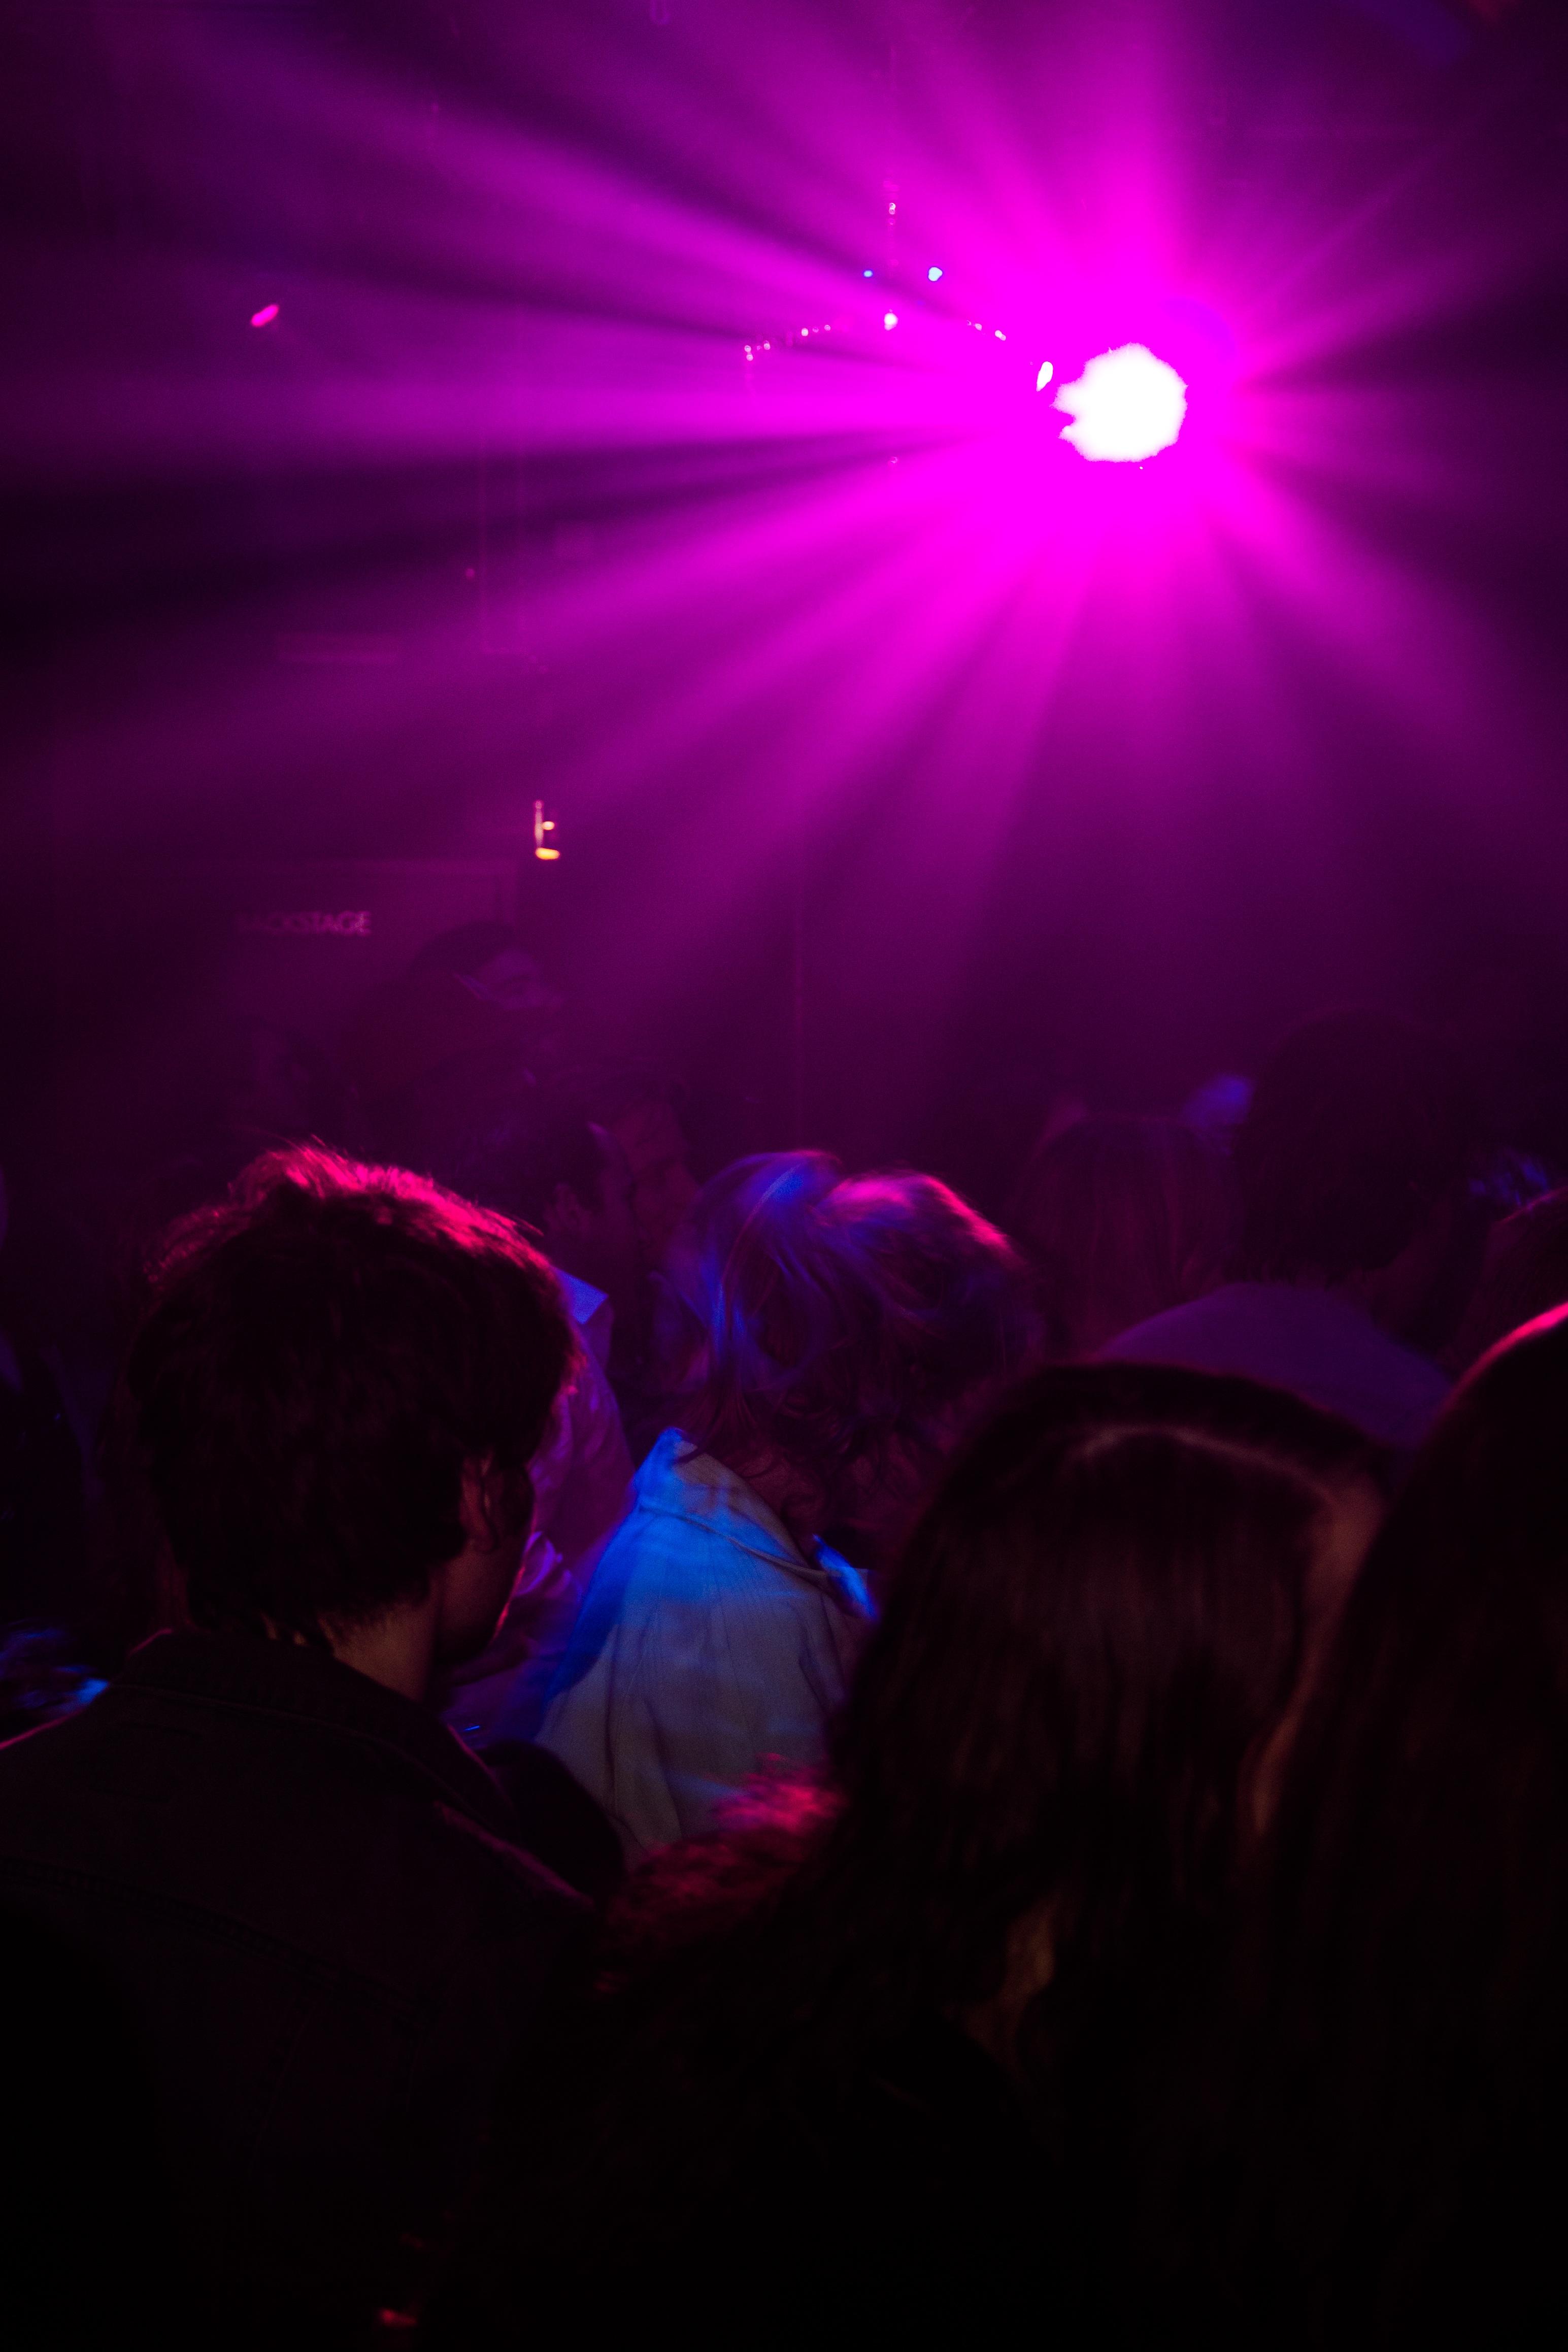 Free Images Music Light Night Purple Atmosphere